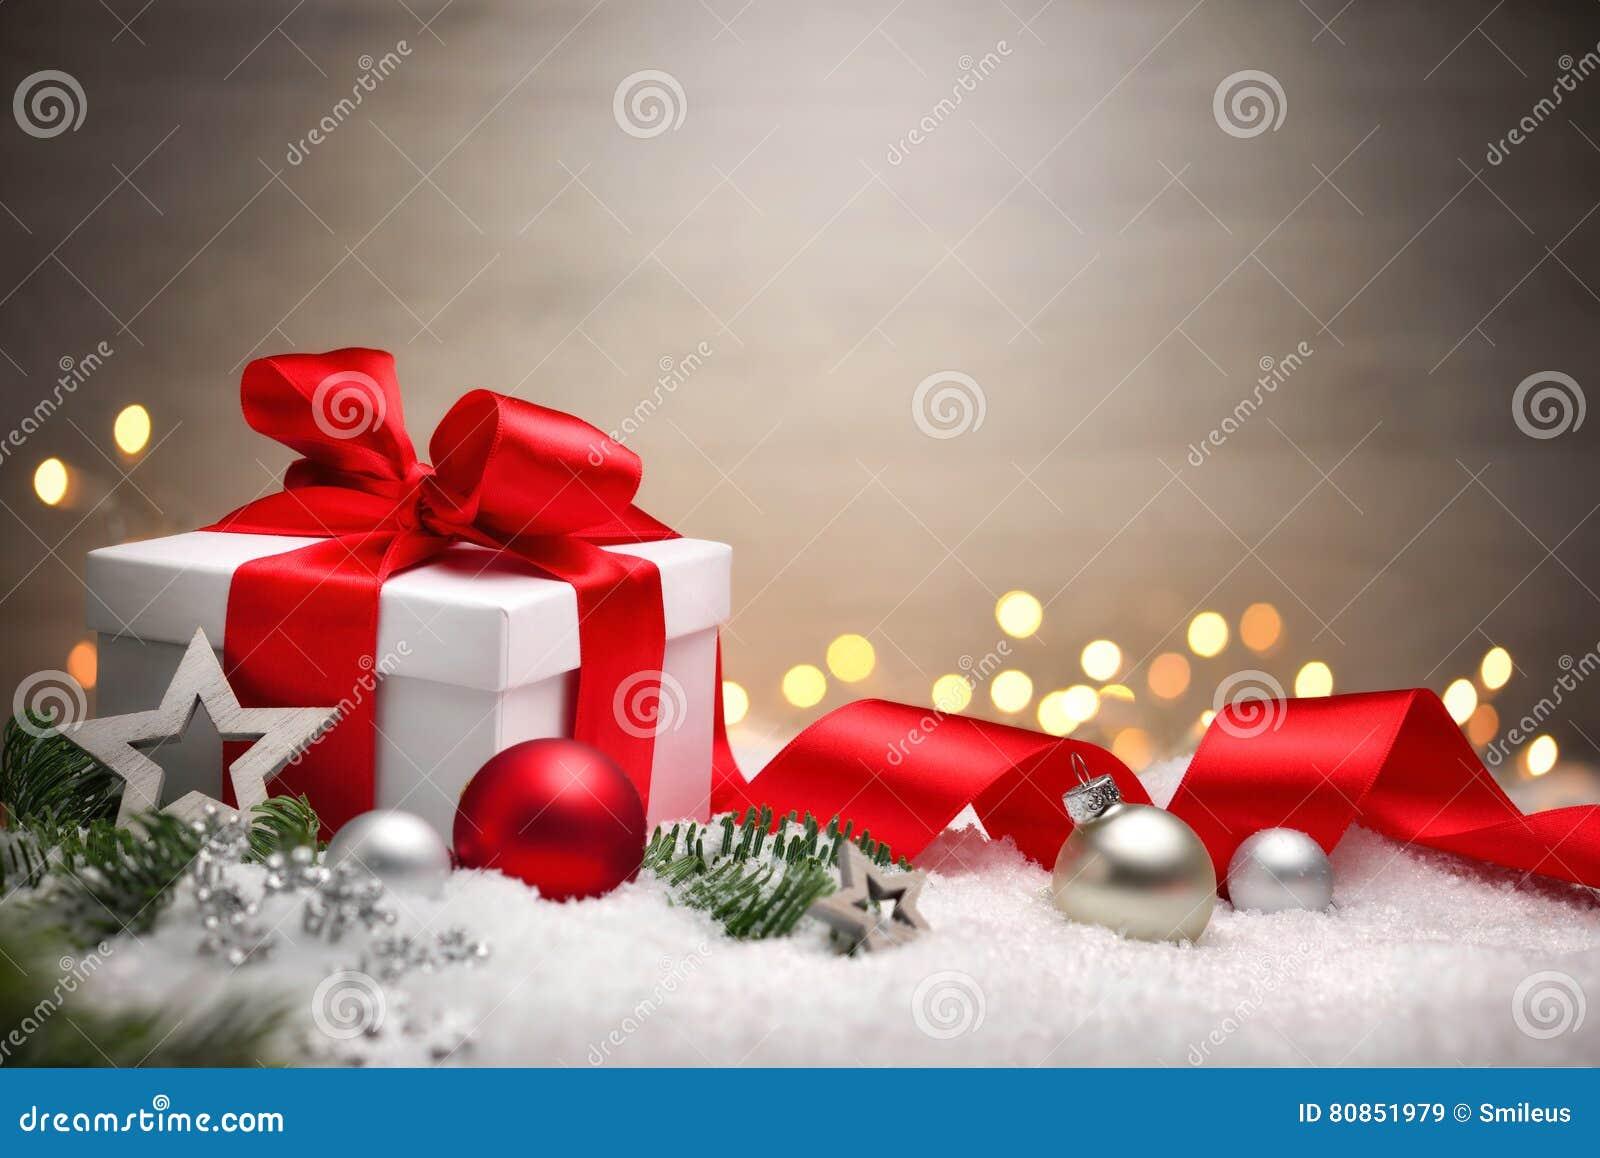 christmas gift in snow elegant background stock image. Black Bedroom Furniture Sets. Home Design Ideas